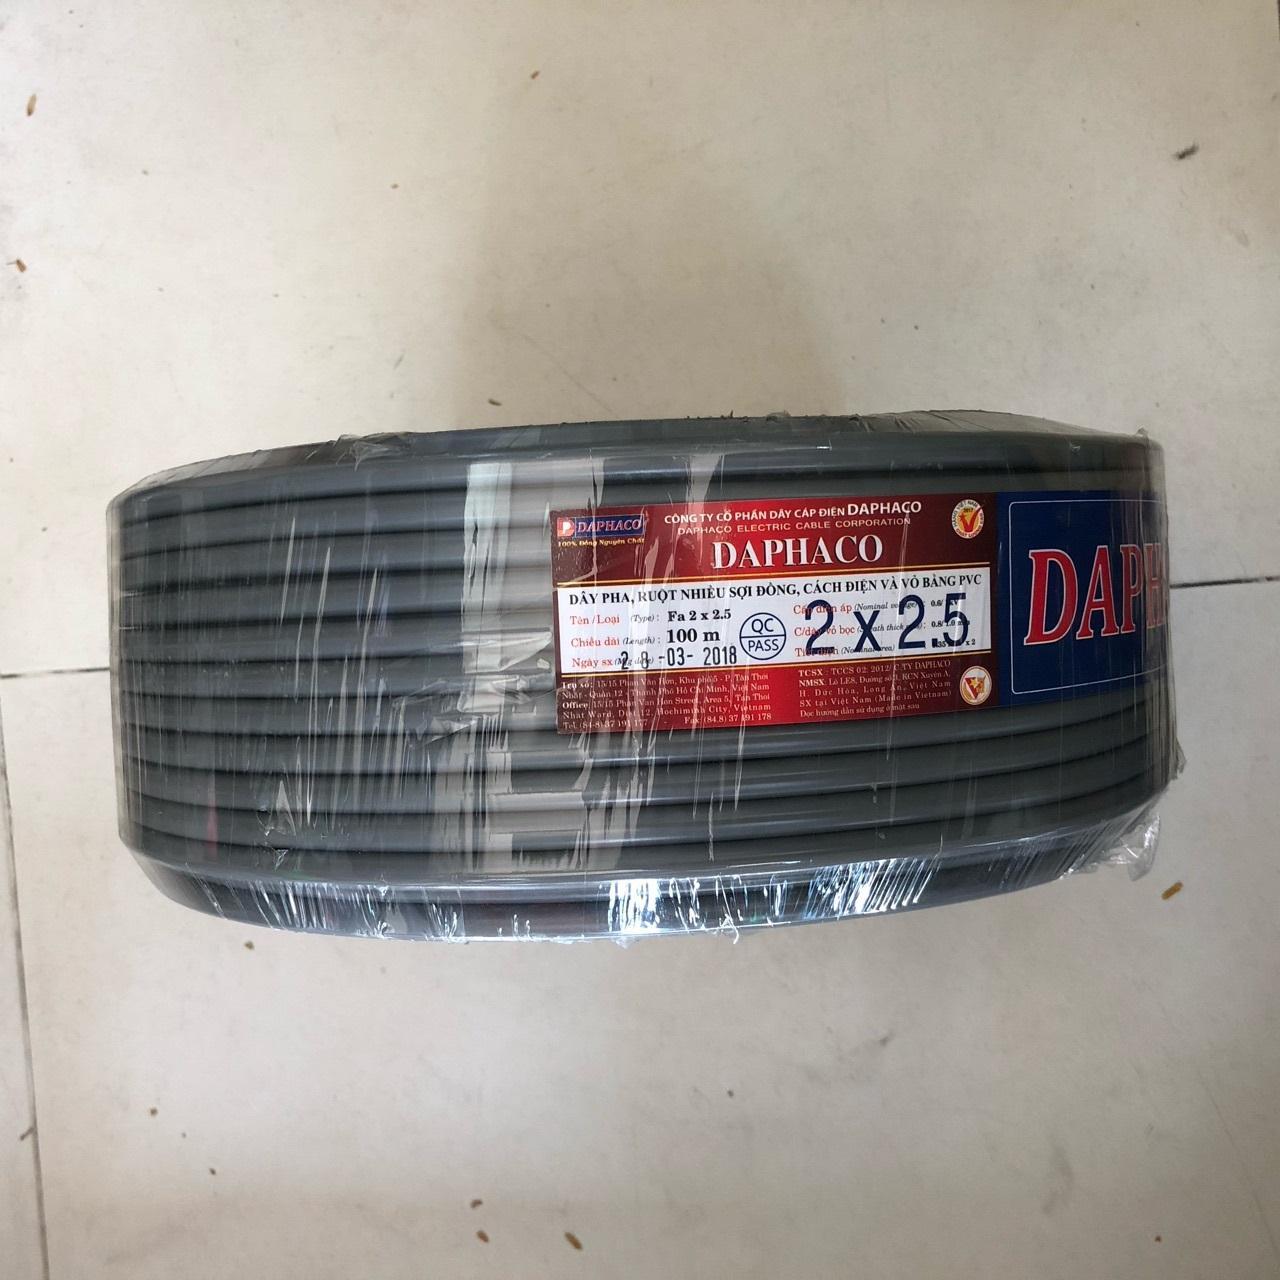 dây điện daphaco FA 2x2.5 cuộn 100 m